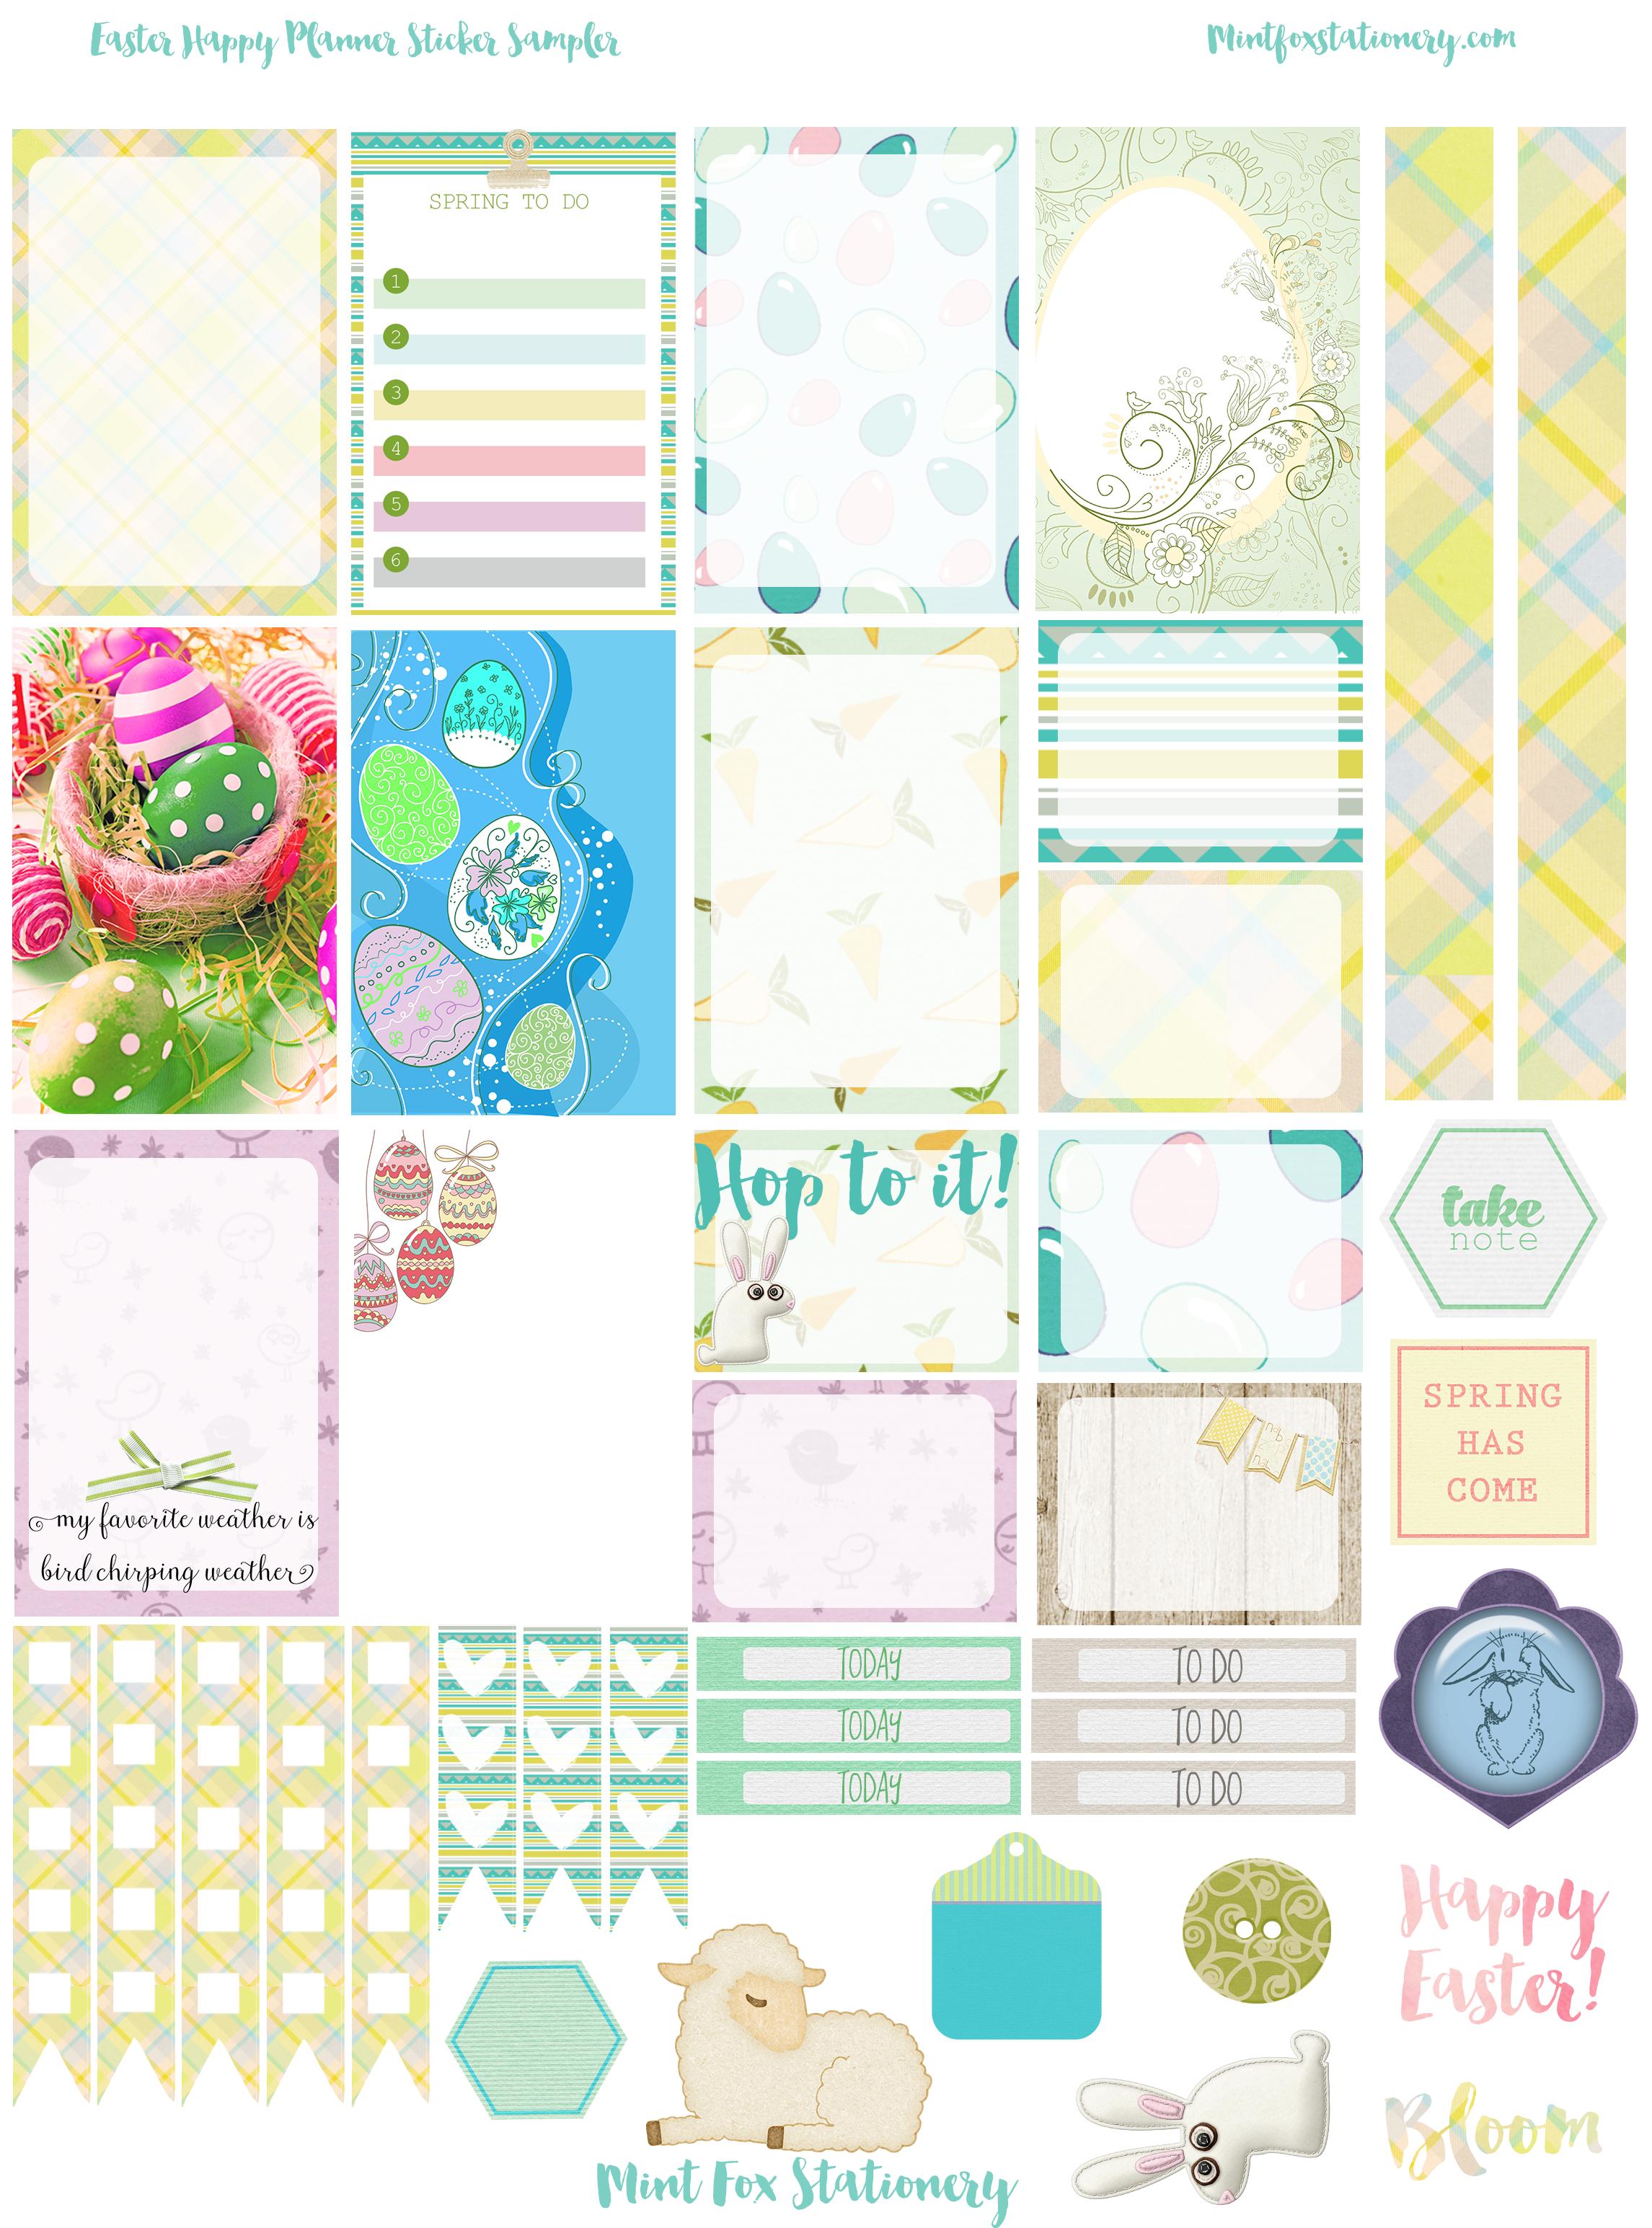 Easter Happy Planner Printable Sticker Sampler Free! - Happy Planner Free Printable Stickers